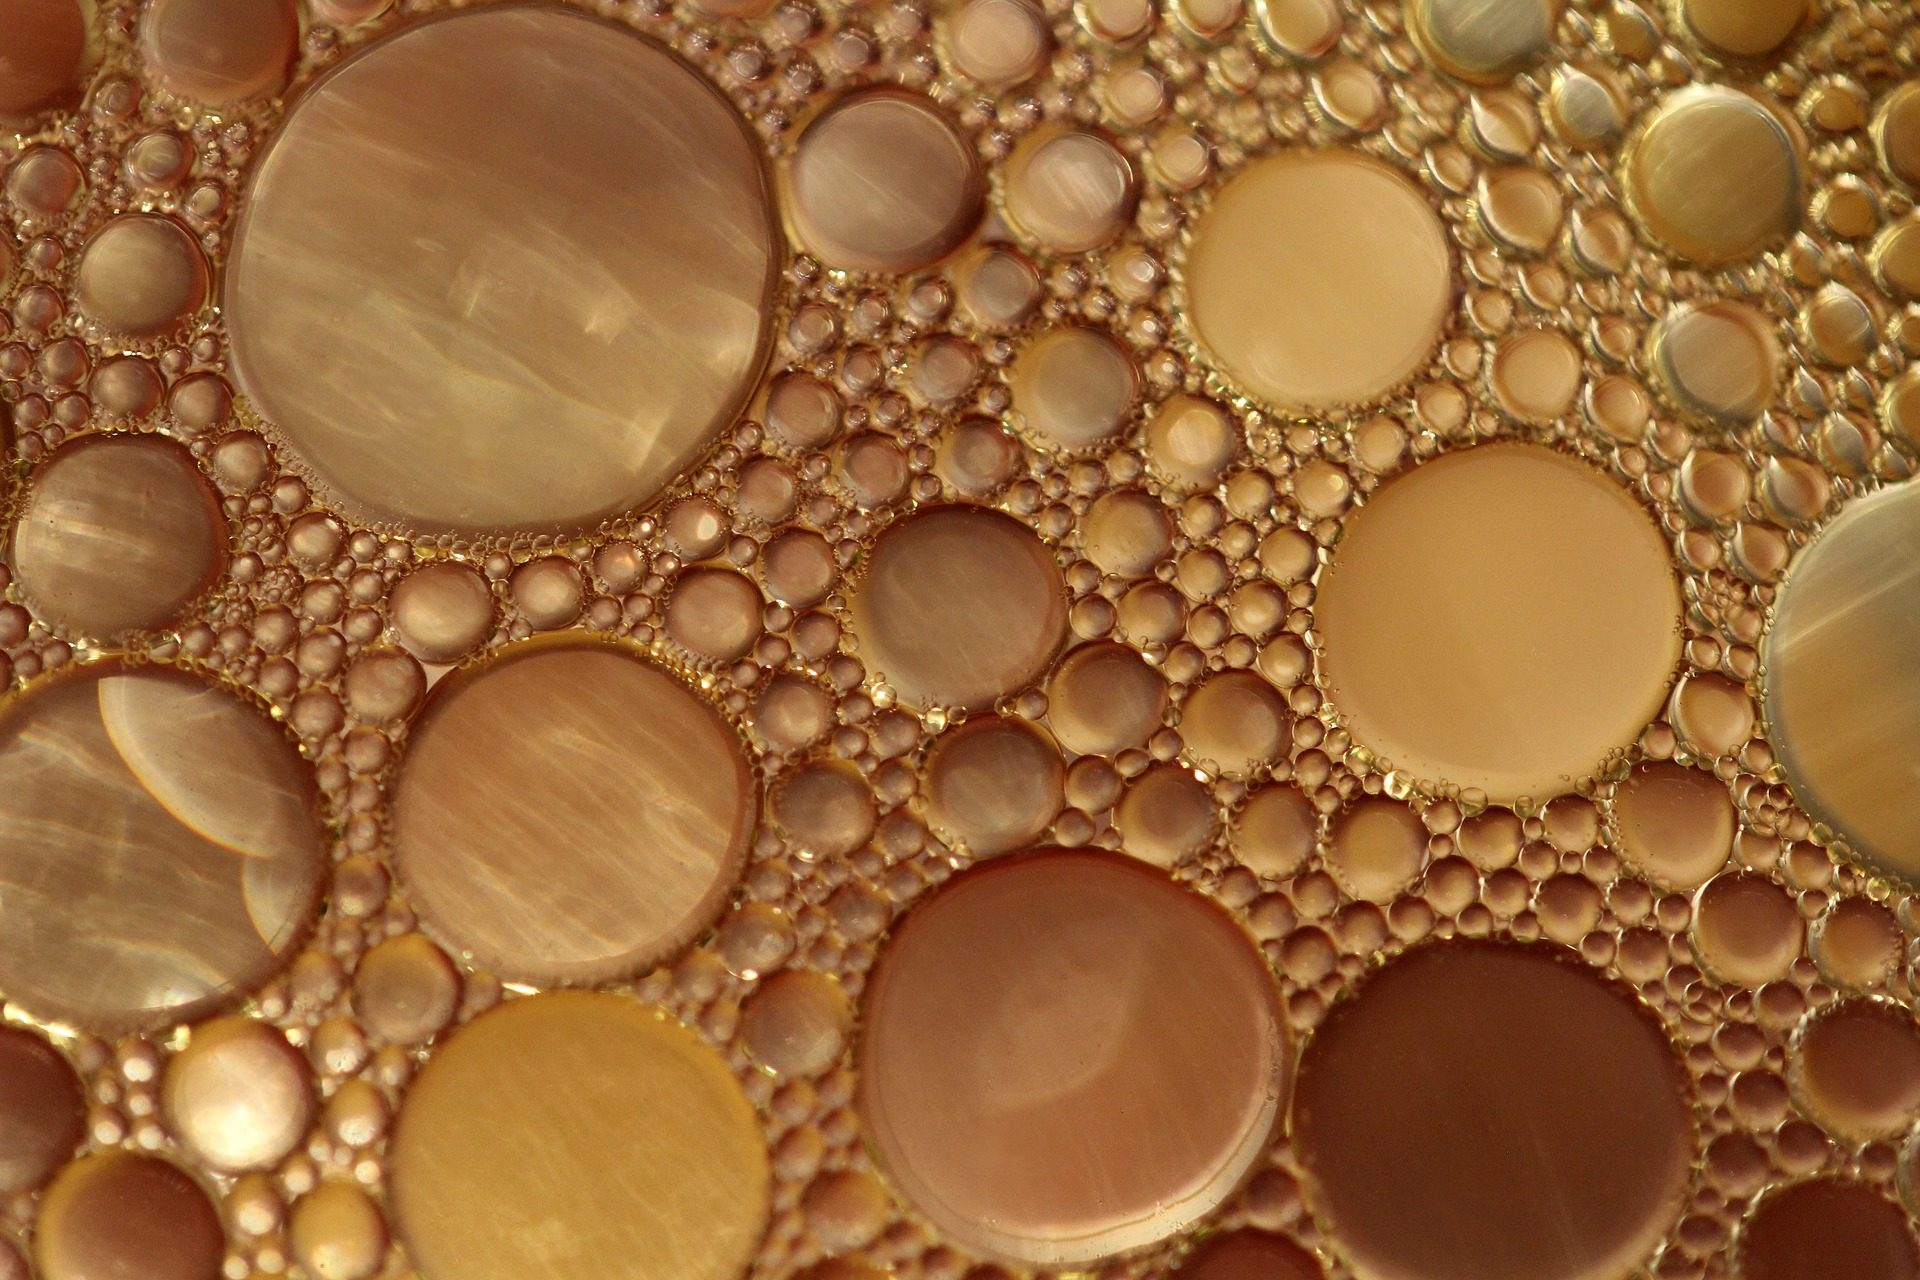 accepté, eau, densité, viscosité, bulles - Fonds d'écran HD - Professor-falken.com